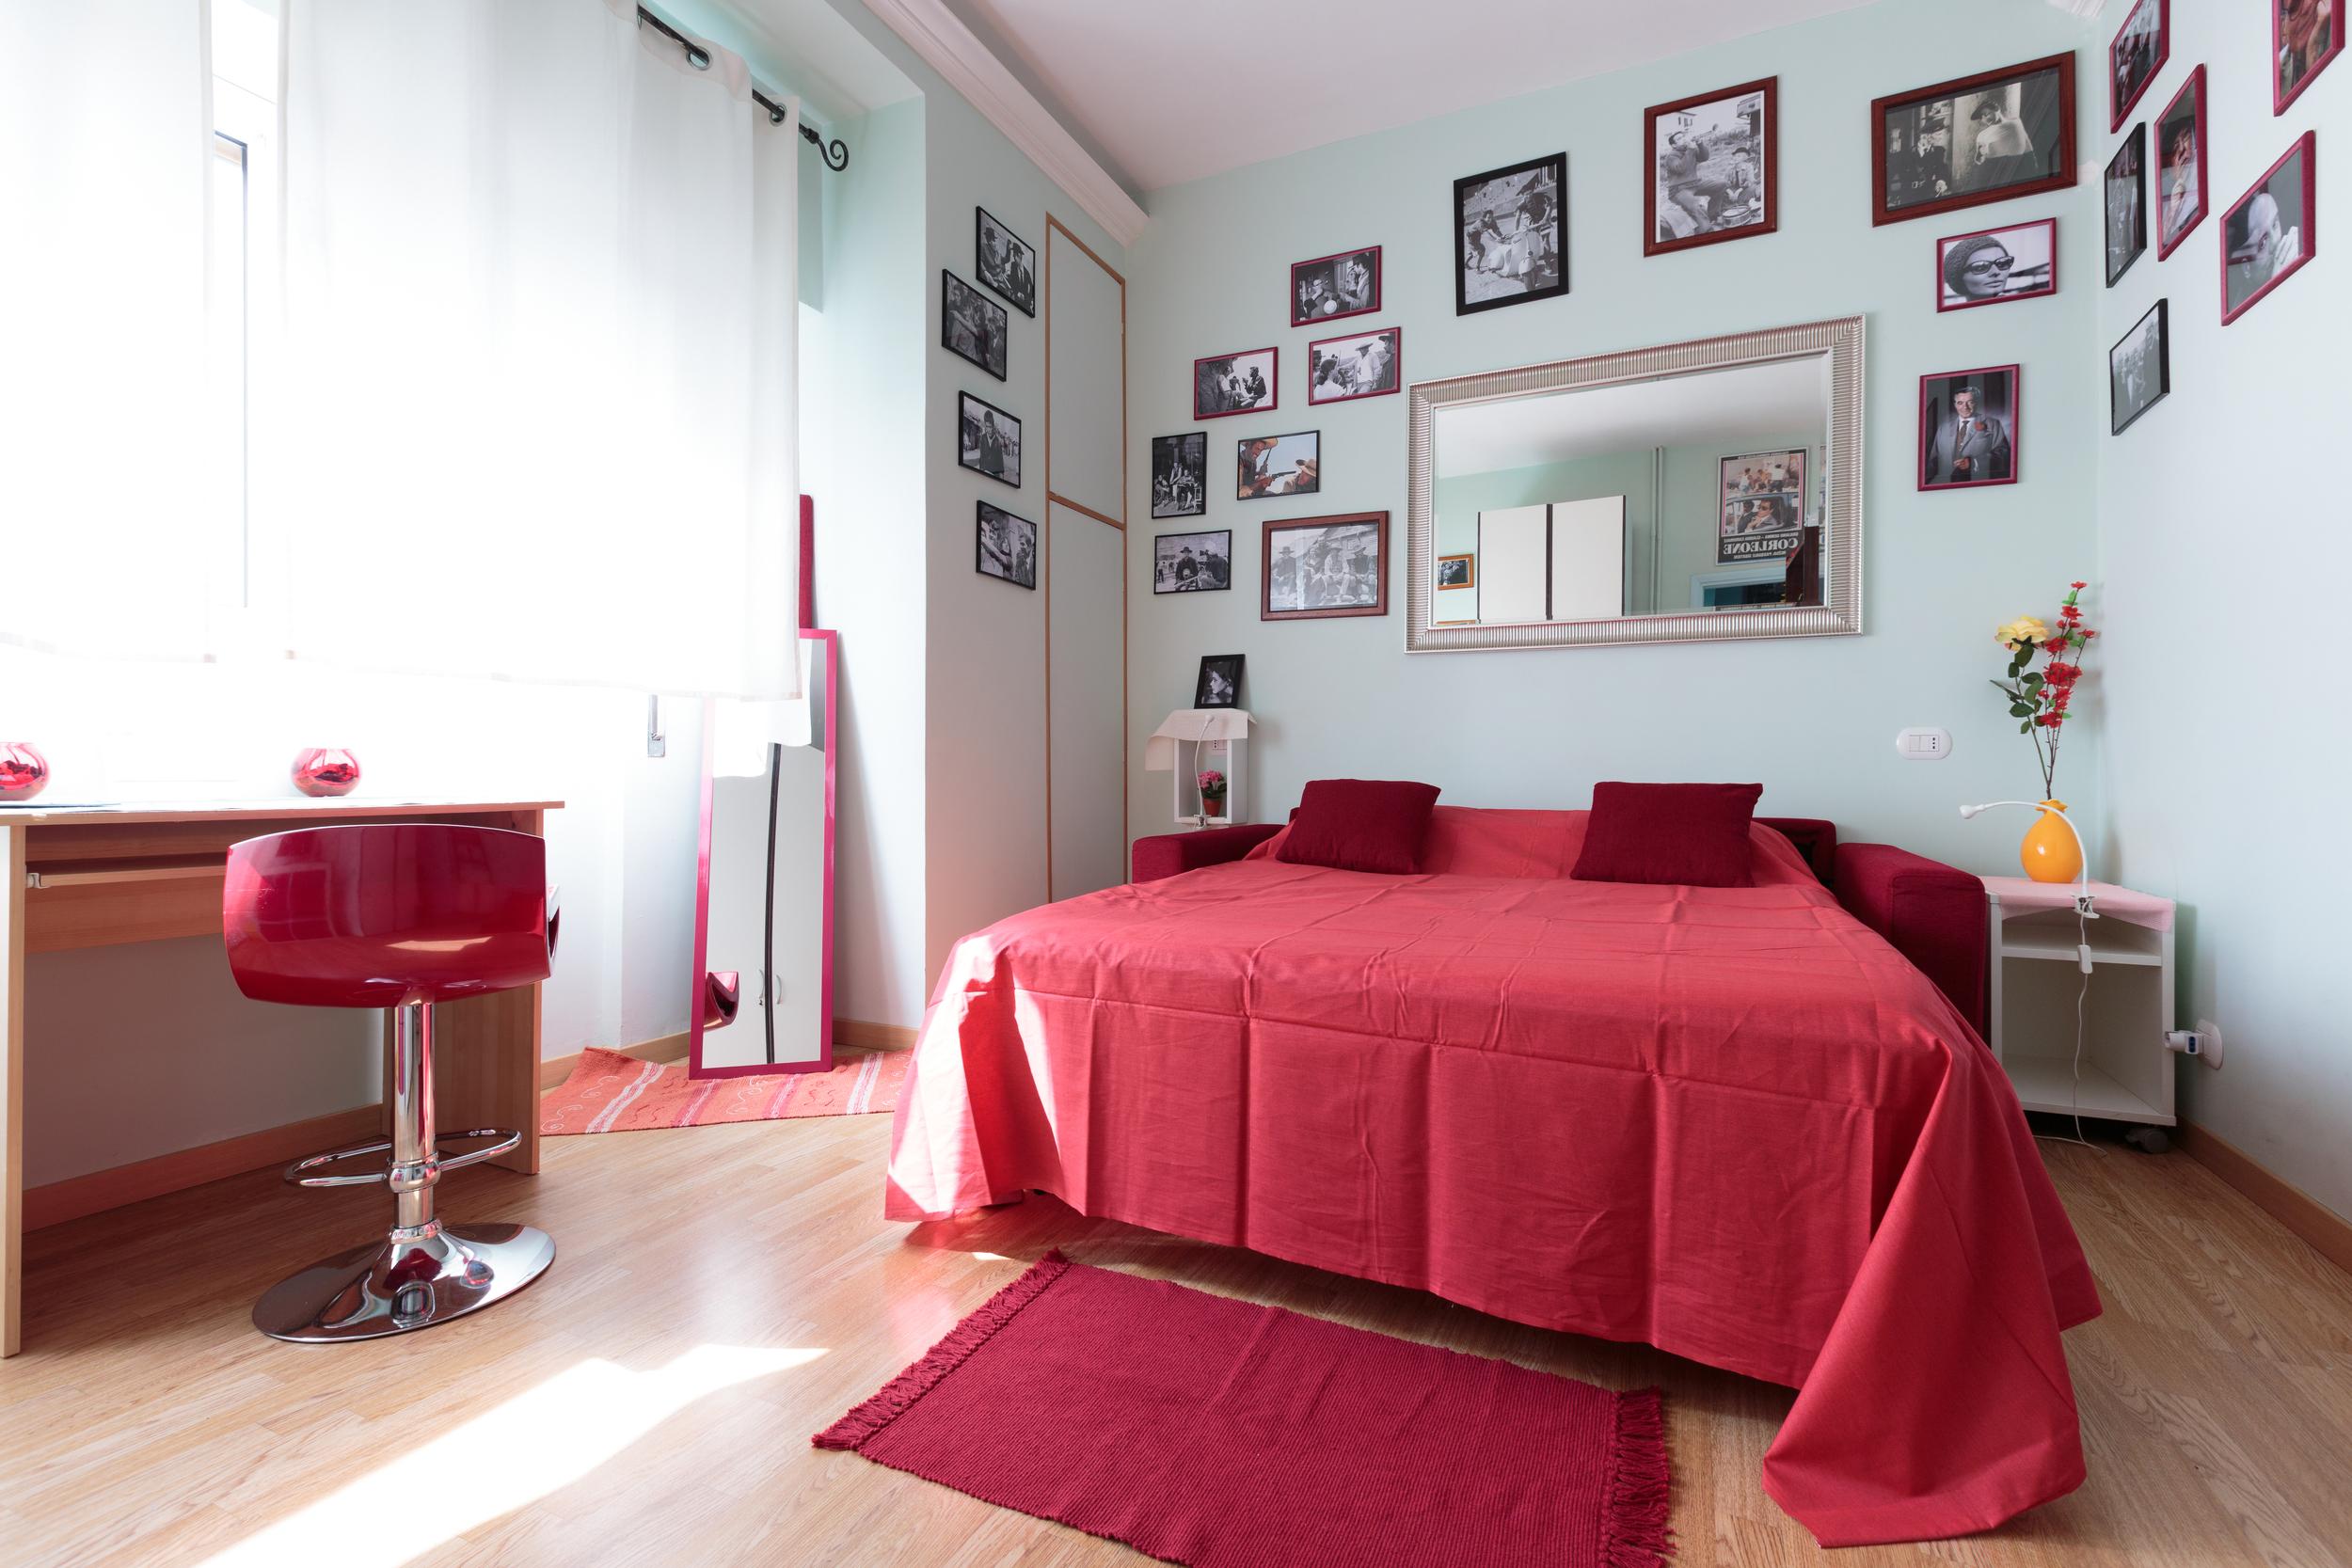 redroom1.jpg